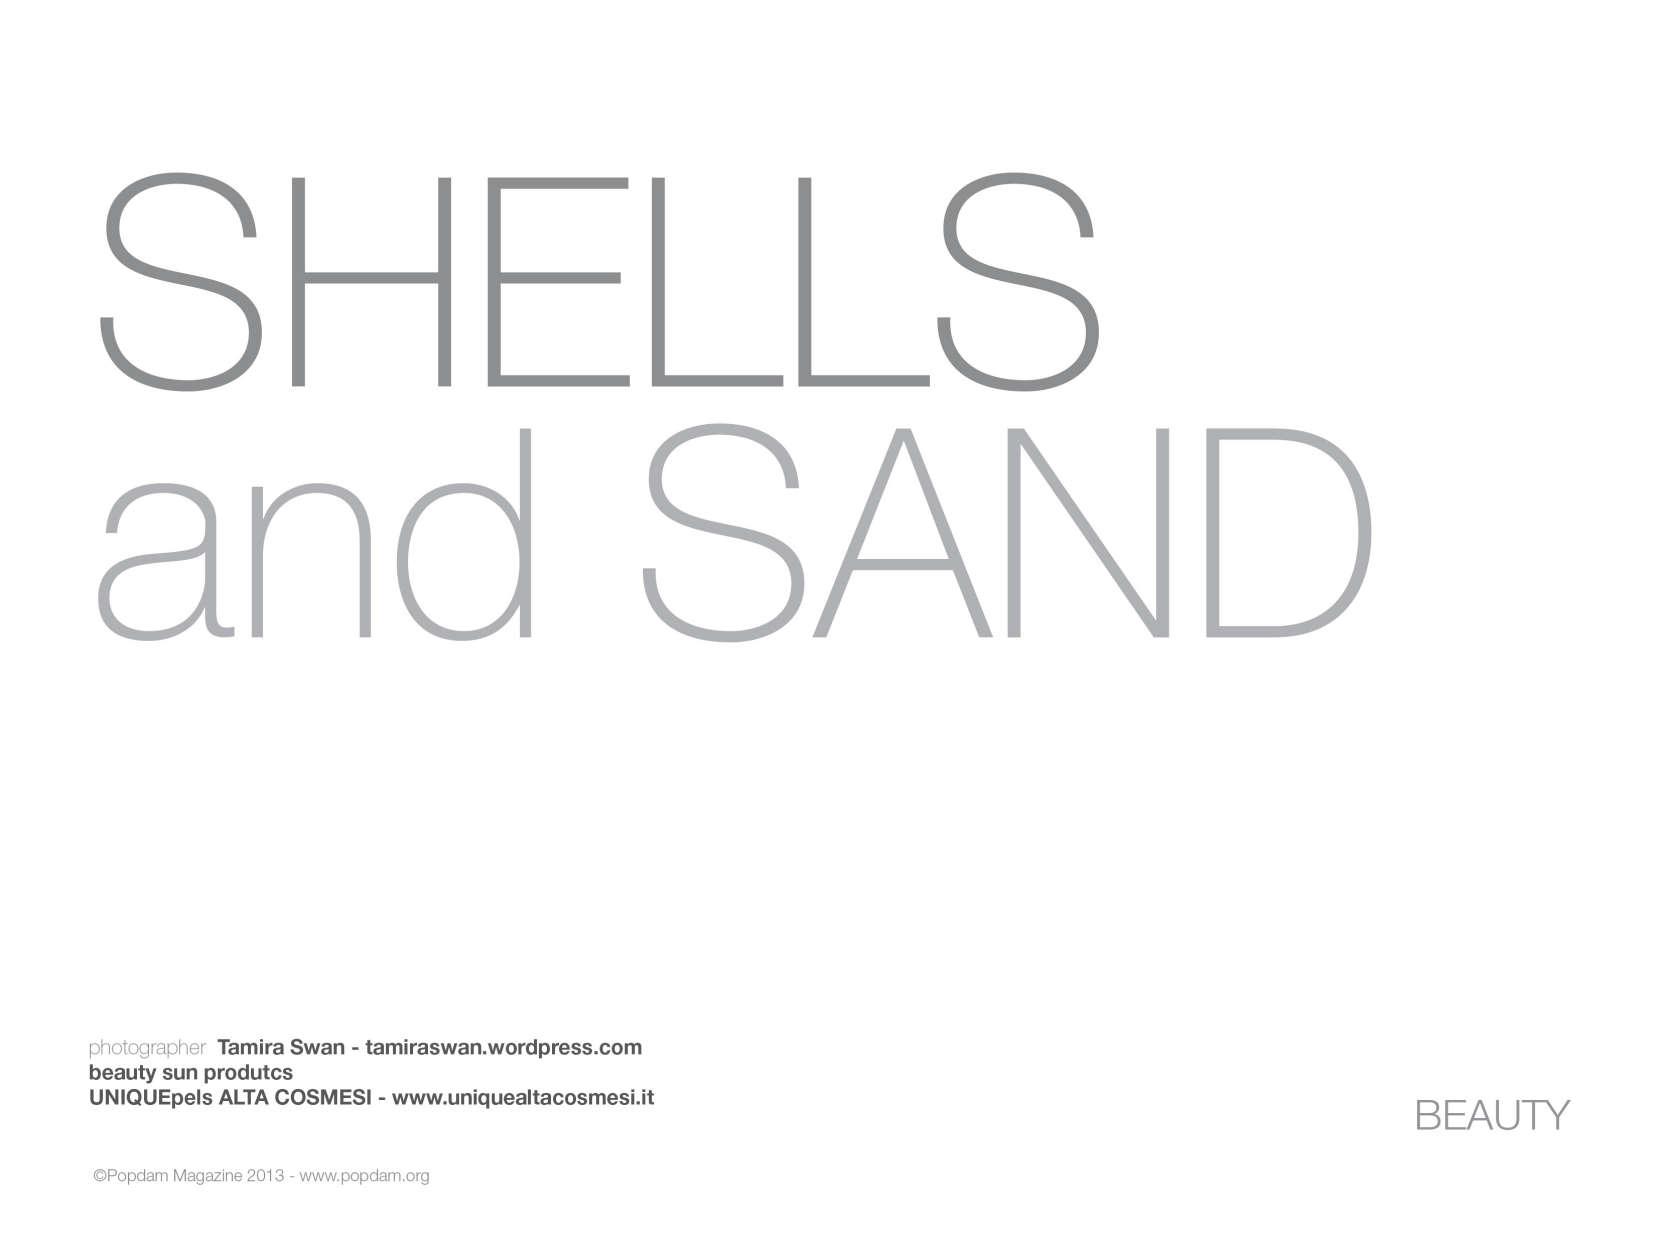 SHELLS-AND-SAND1-1660x1245.jpg